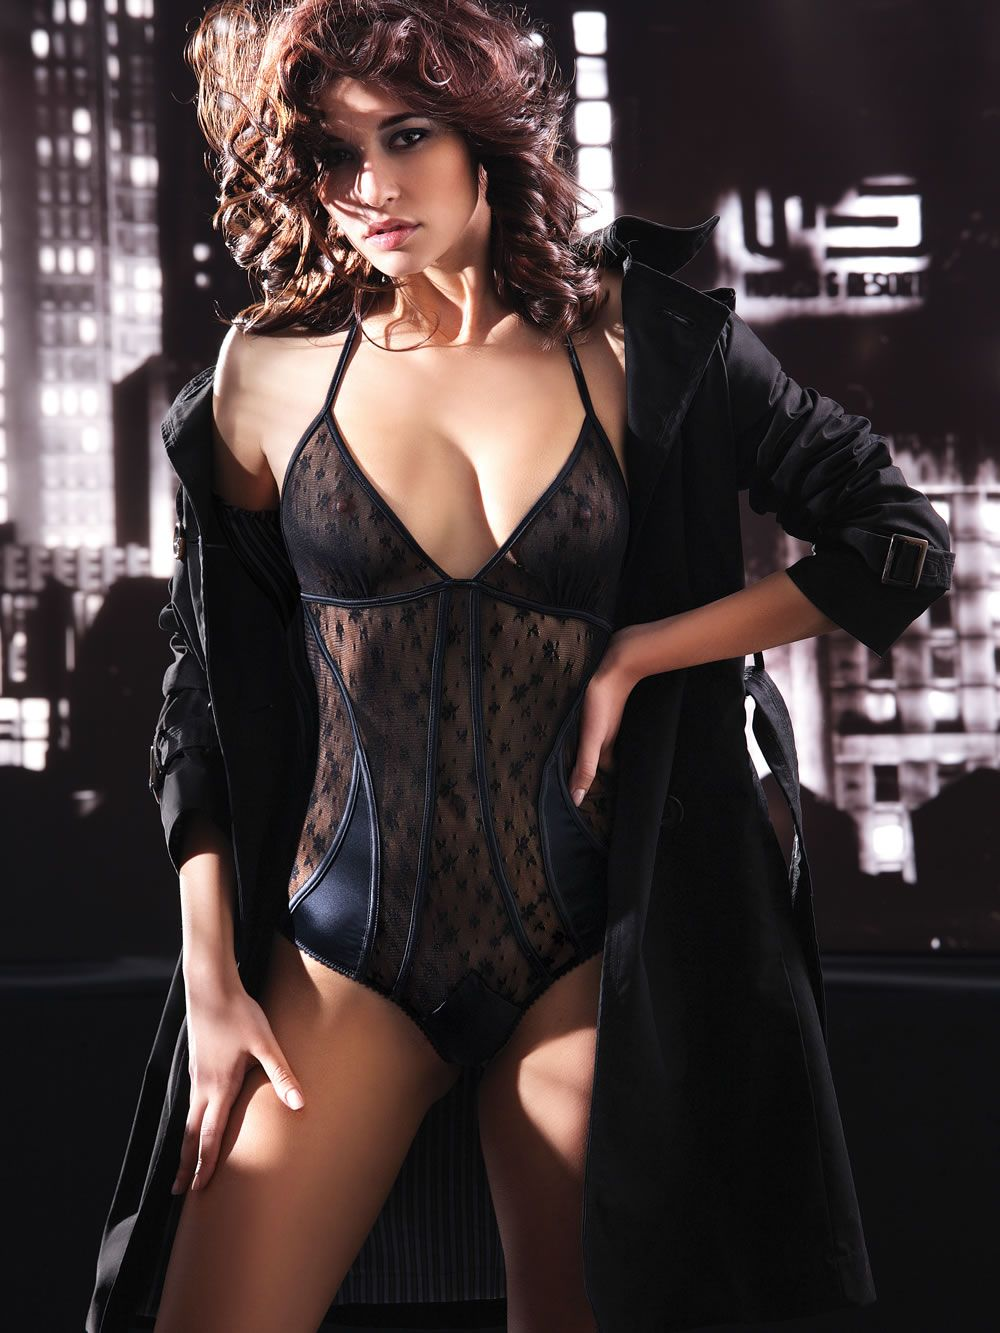 Jolidon Irresistable Bodysuit | Buy Lingerie Online Australia ...